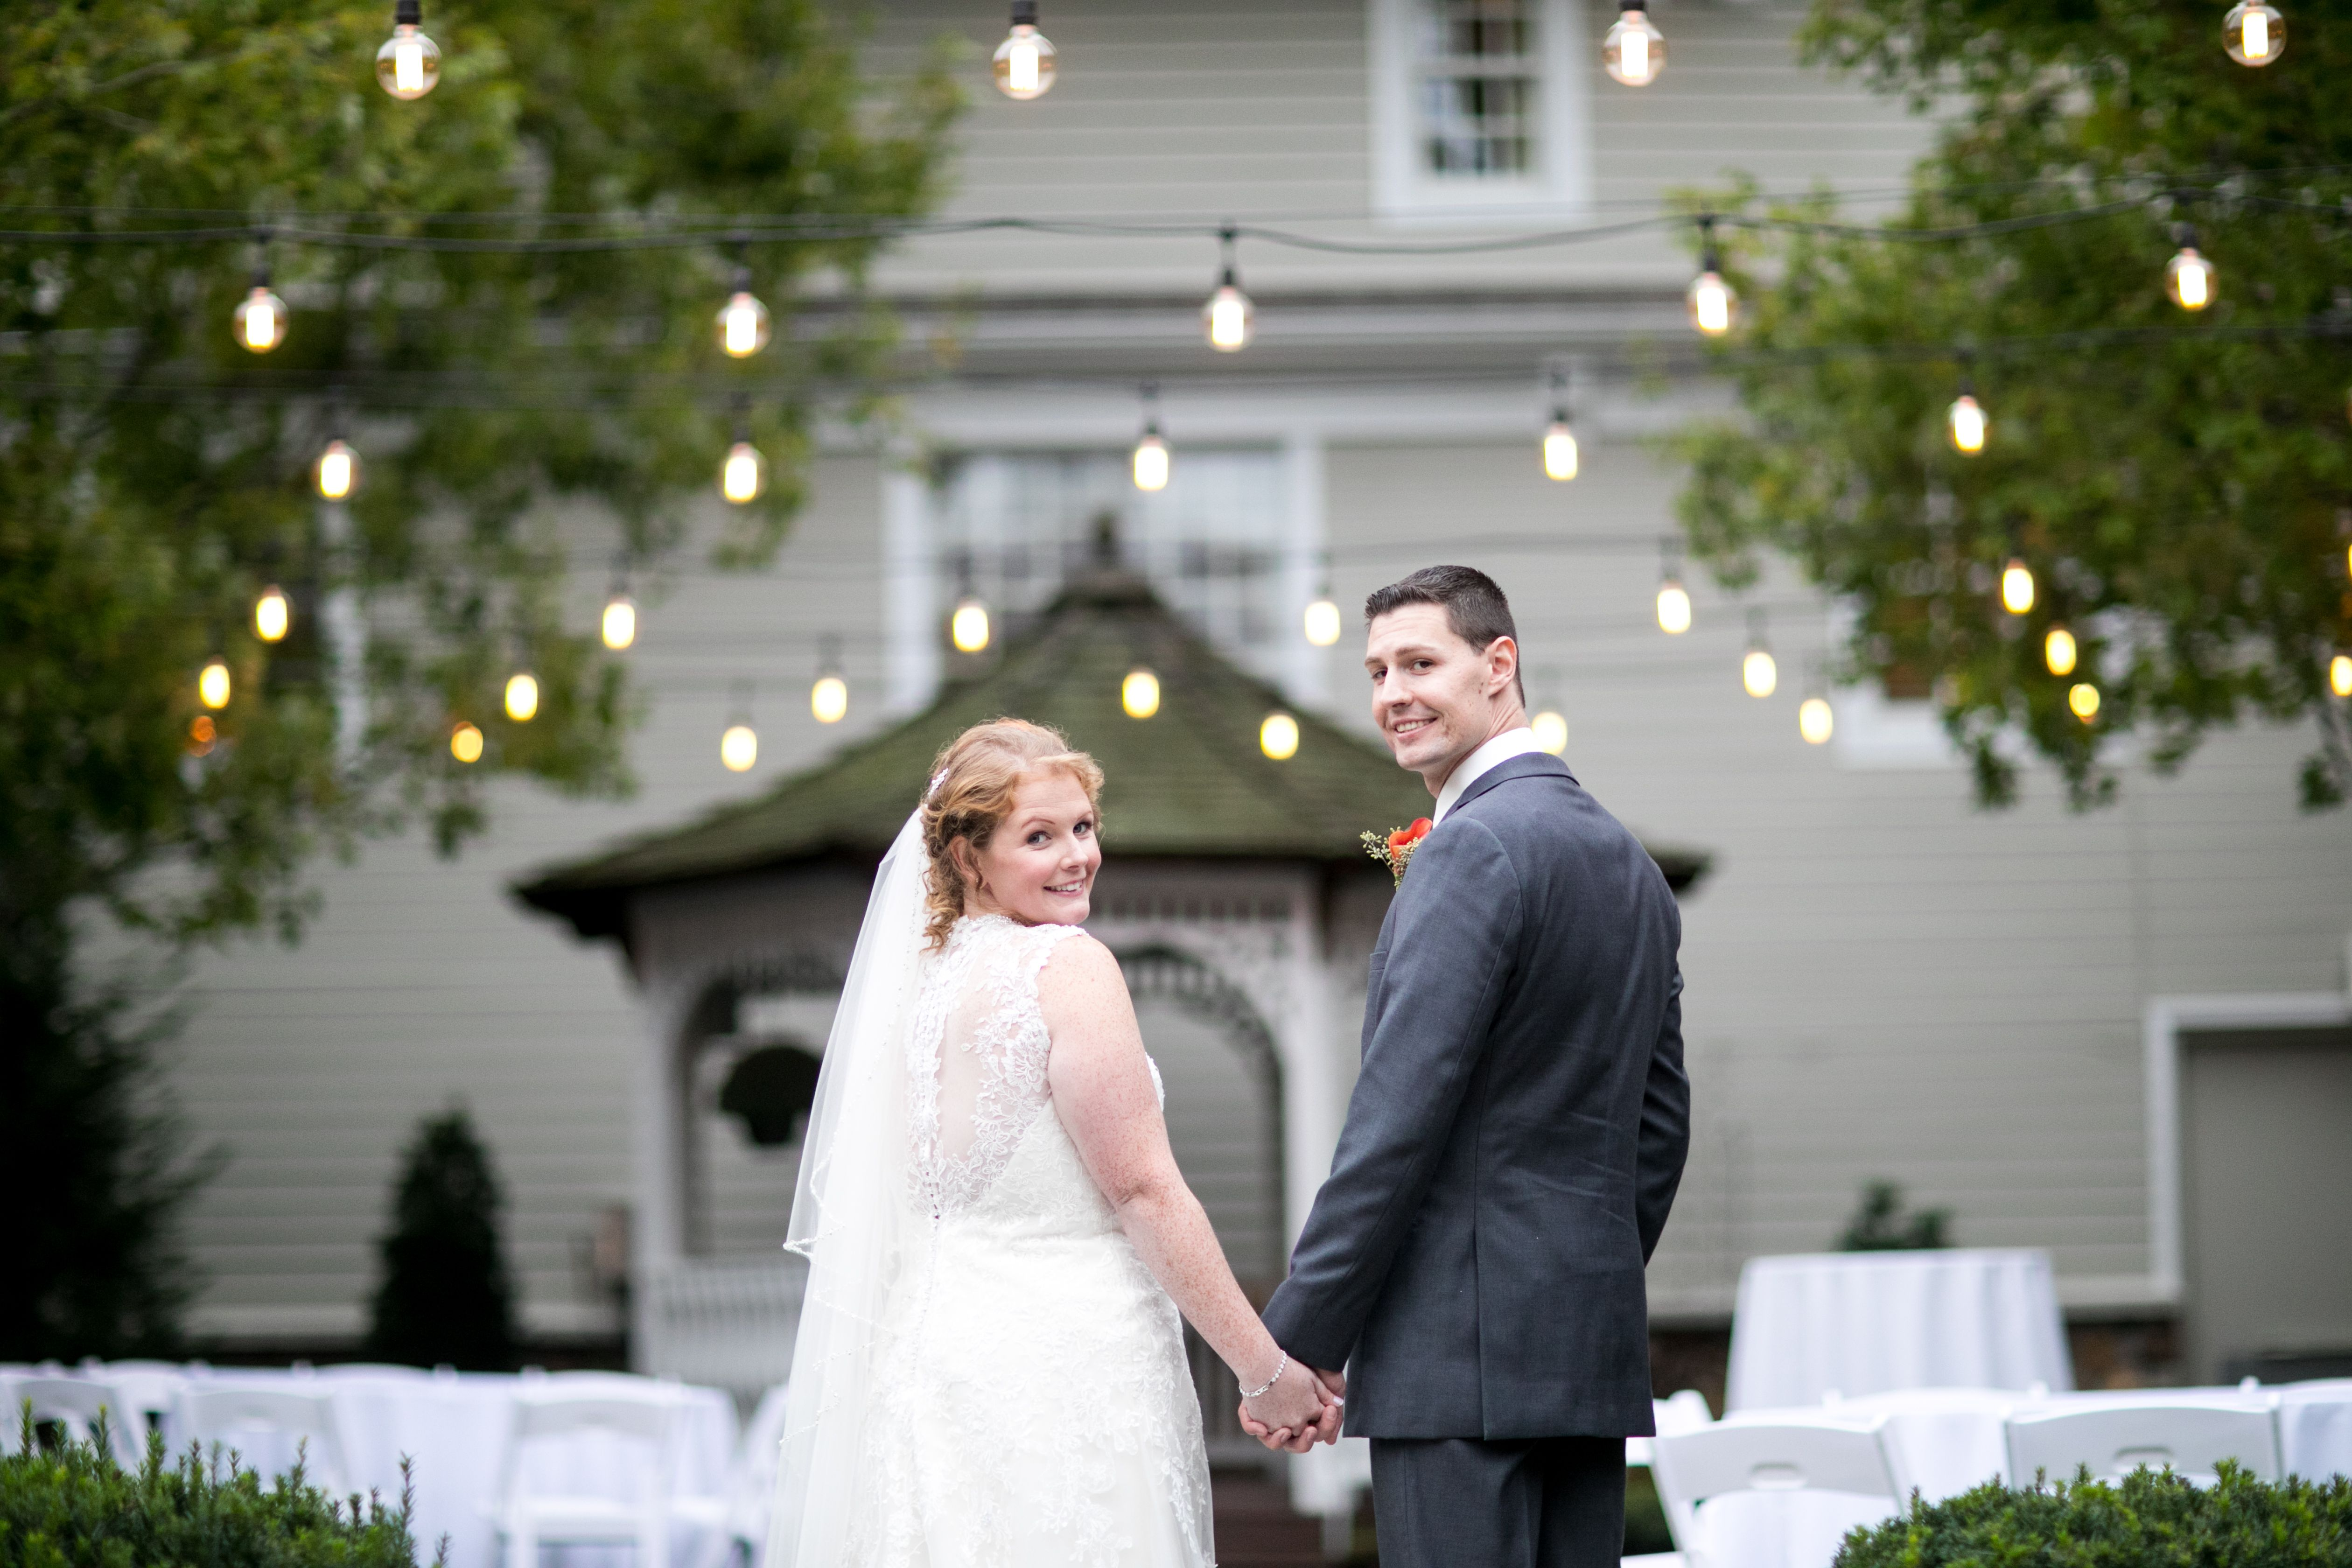 Shannon and Ryan used our Courtyard as the backdrop for their gorgeous wedding photos! (Gary Flom Photography) #Wedding #WeddingVenue #NJWeddings #Unique